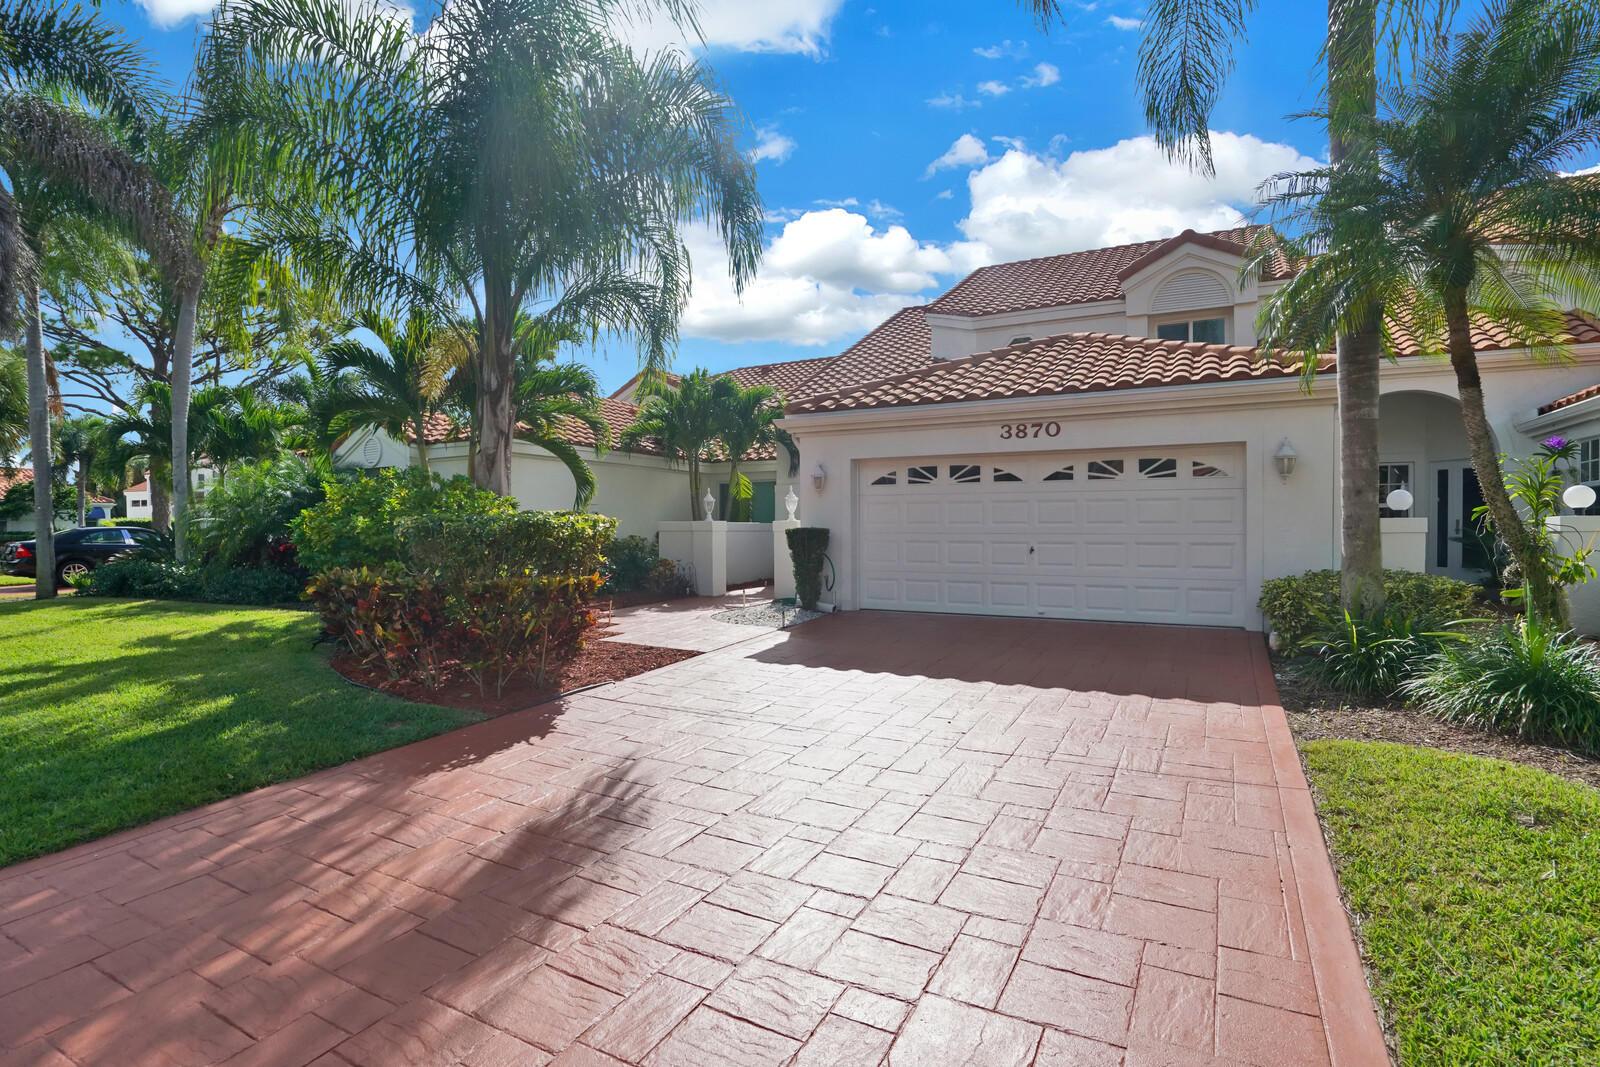 3870 Candlewood Boulevard  Boca Raton, FL 33487